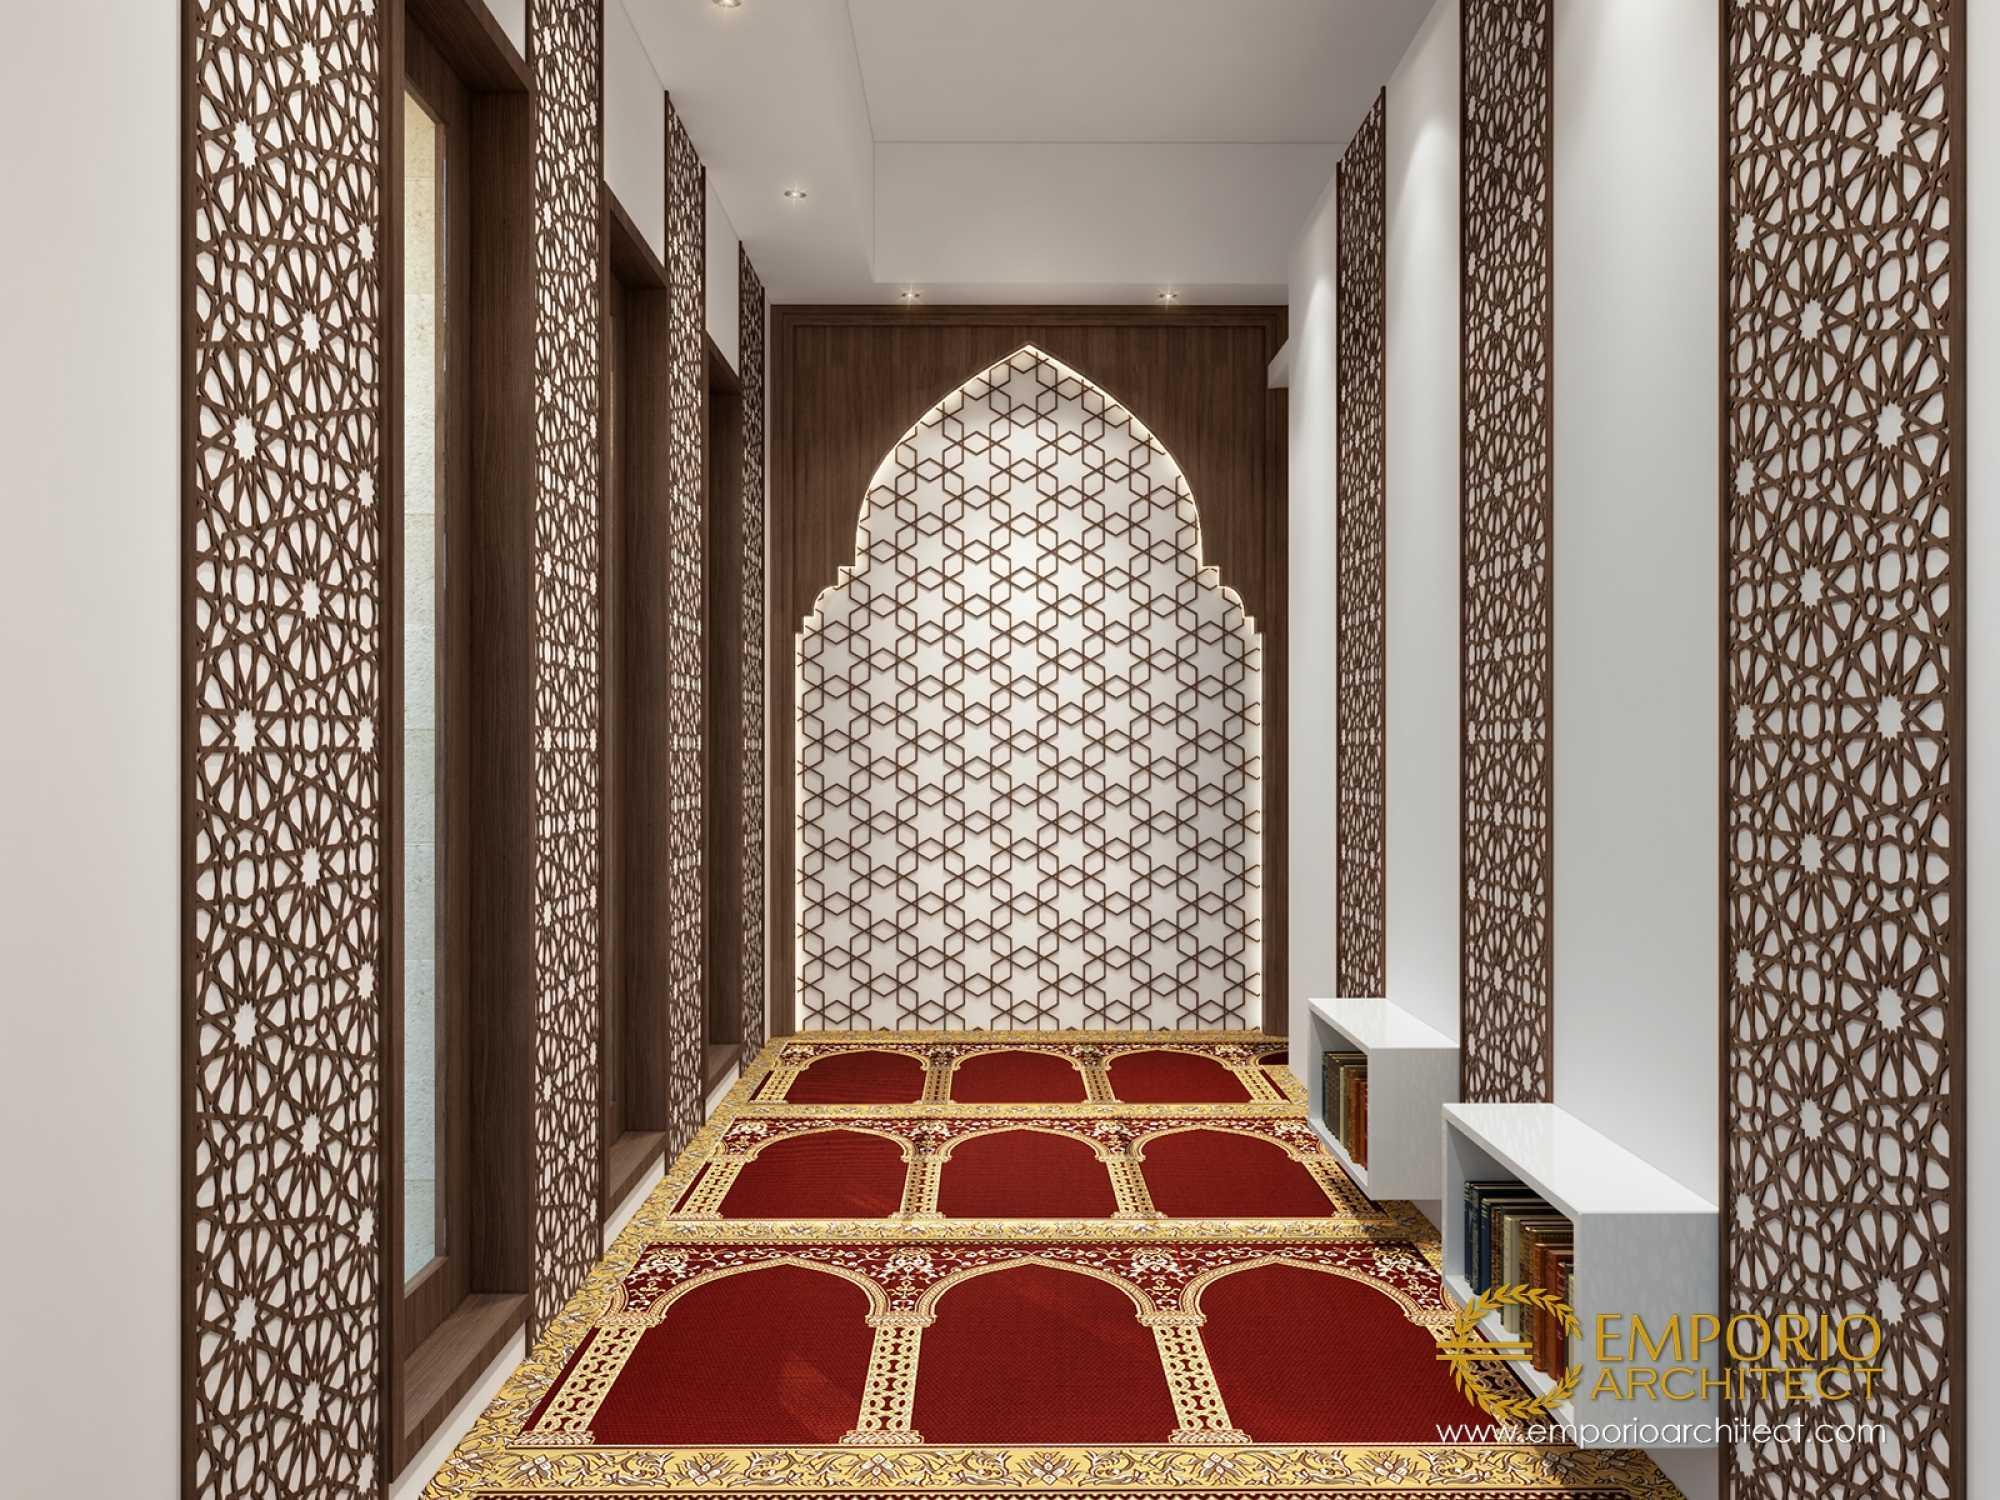 Emporio Architect Desain Rumah Villa Bali Tropis 371 @ Aceh Aceh, Indonesia Aceh, Indonesia Emporio-Architect-Desain-Rumah-Villa-Bali-Tropis-371-Aceh  76161